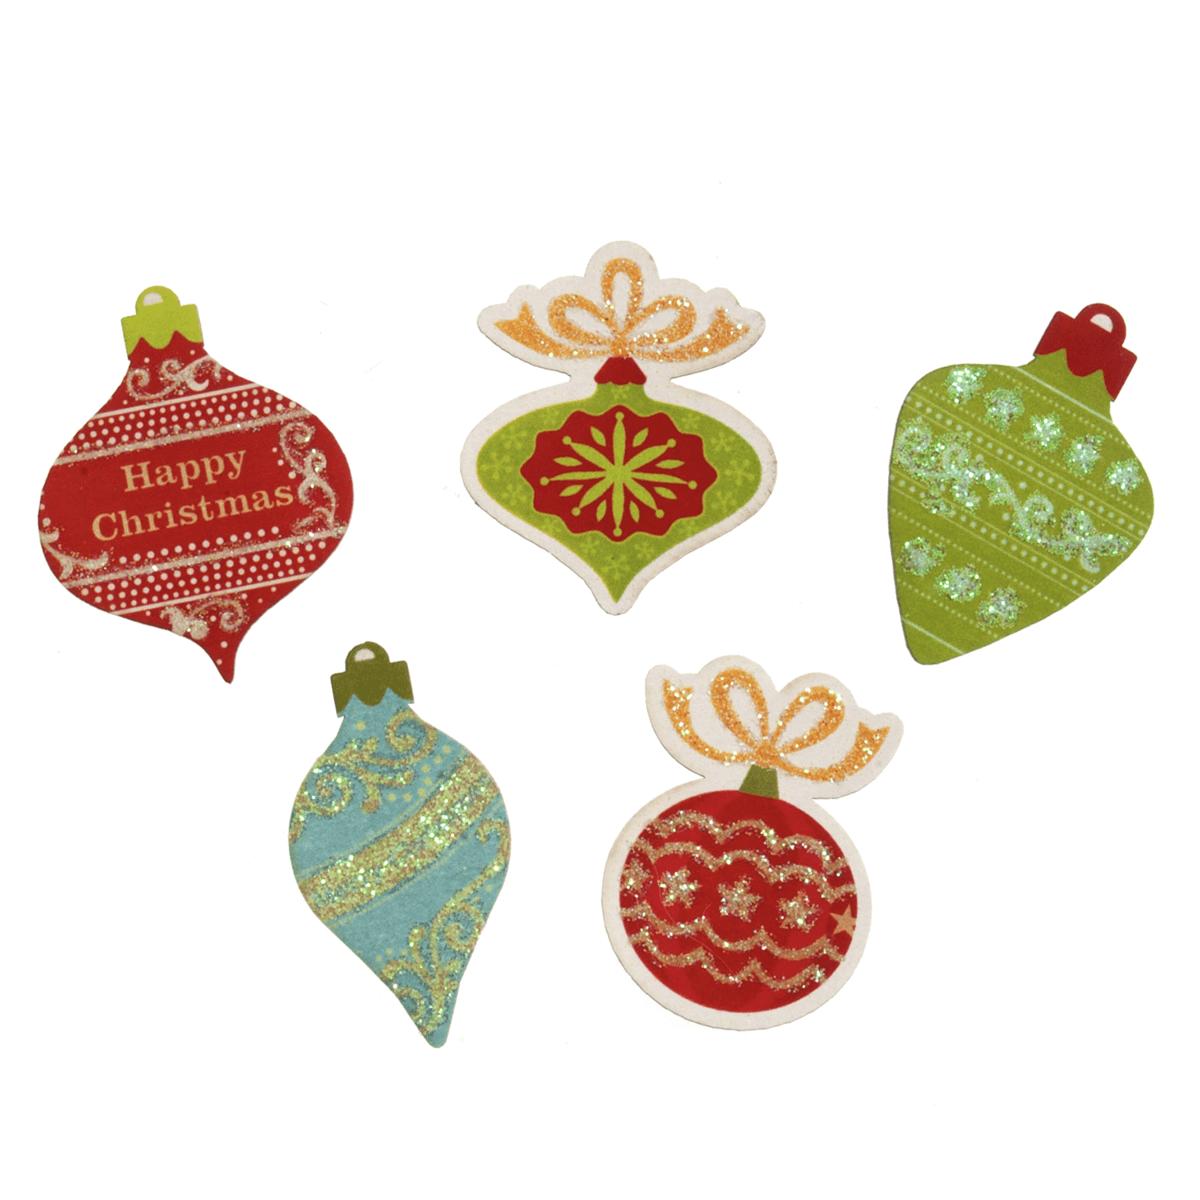 5 x Christmas Glitter Baubles Embellishment Cardmaking Scrapbooking